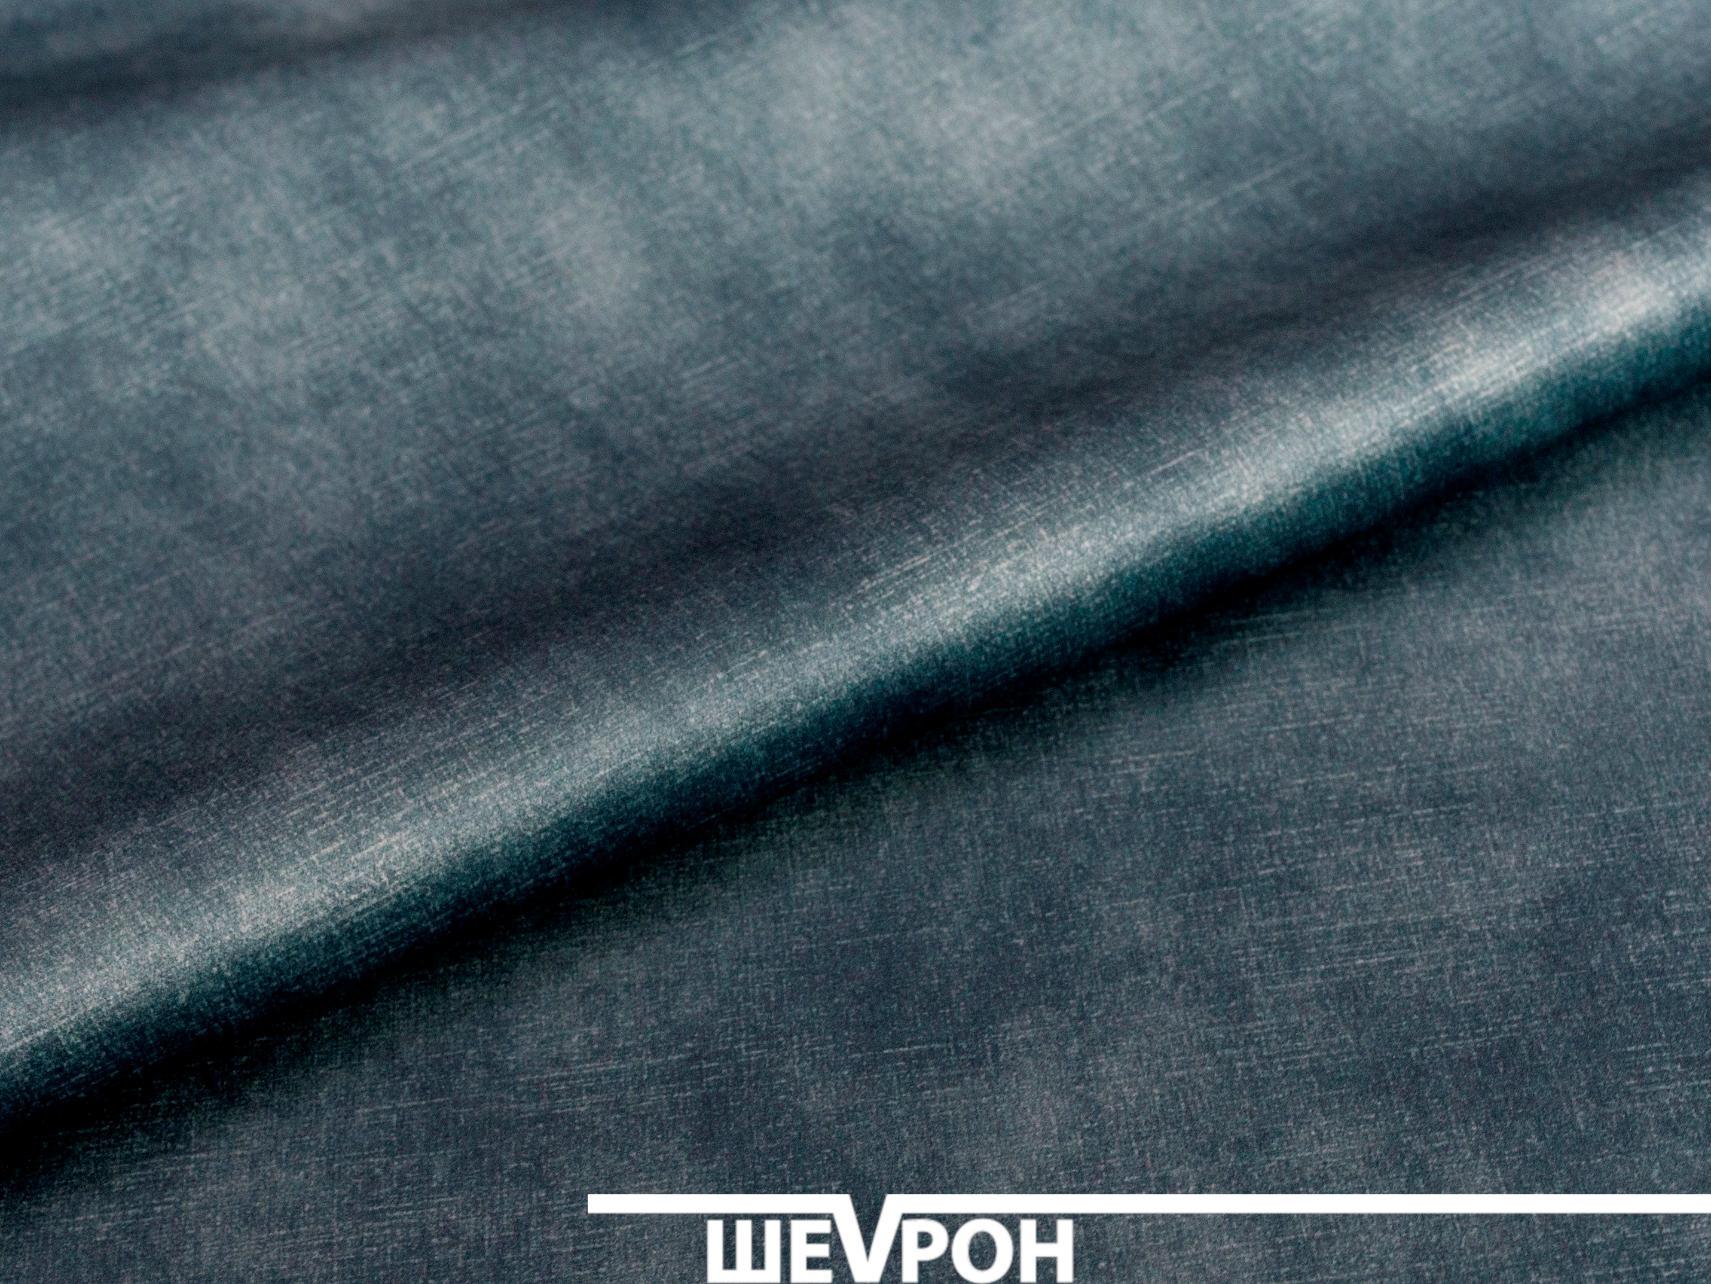 картинка Ткань CRAFT 21 от магазина Шеврон